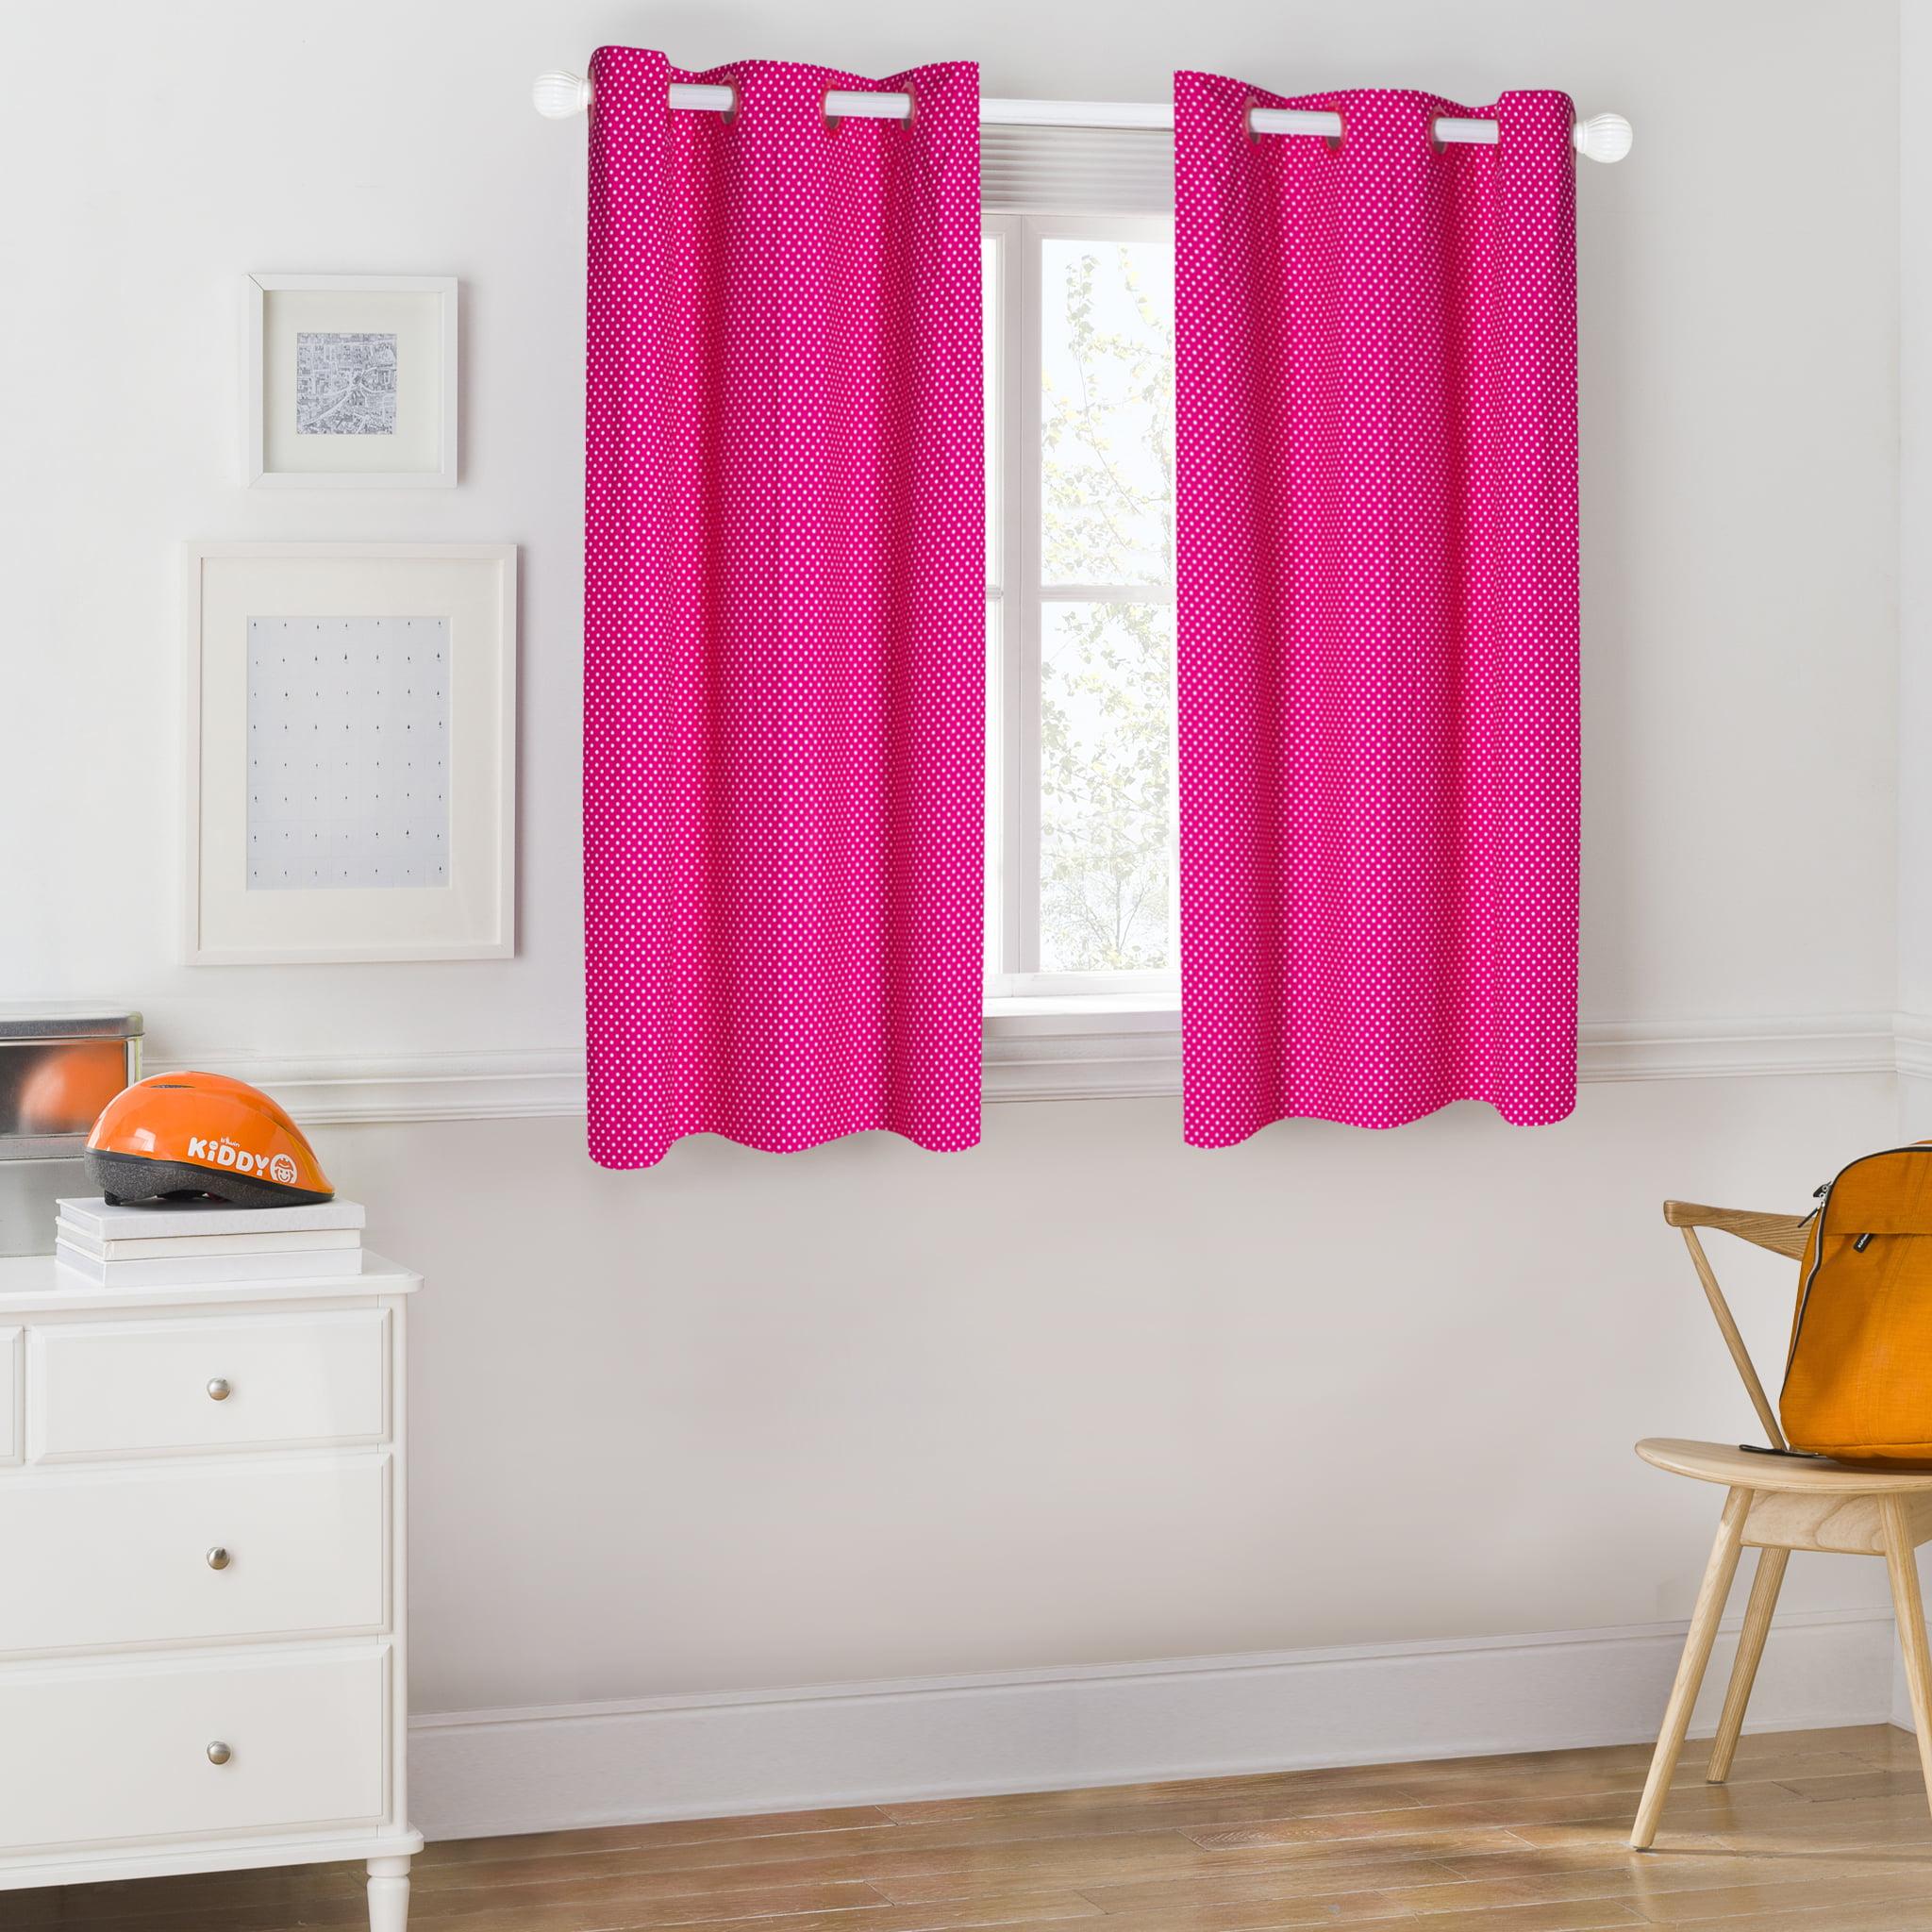 Mainstays Kids Pink Polka Dot Room Darkening Coordinating Window Curtain